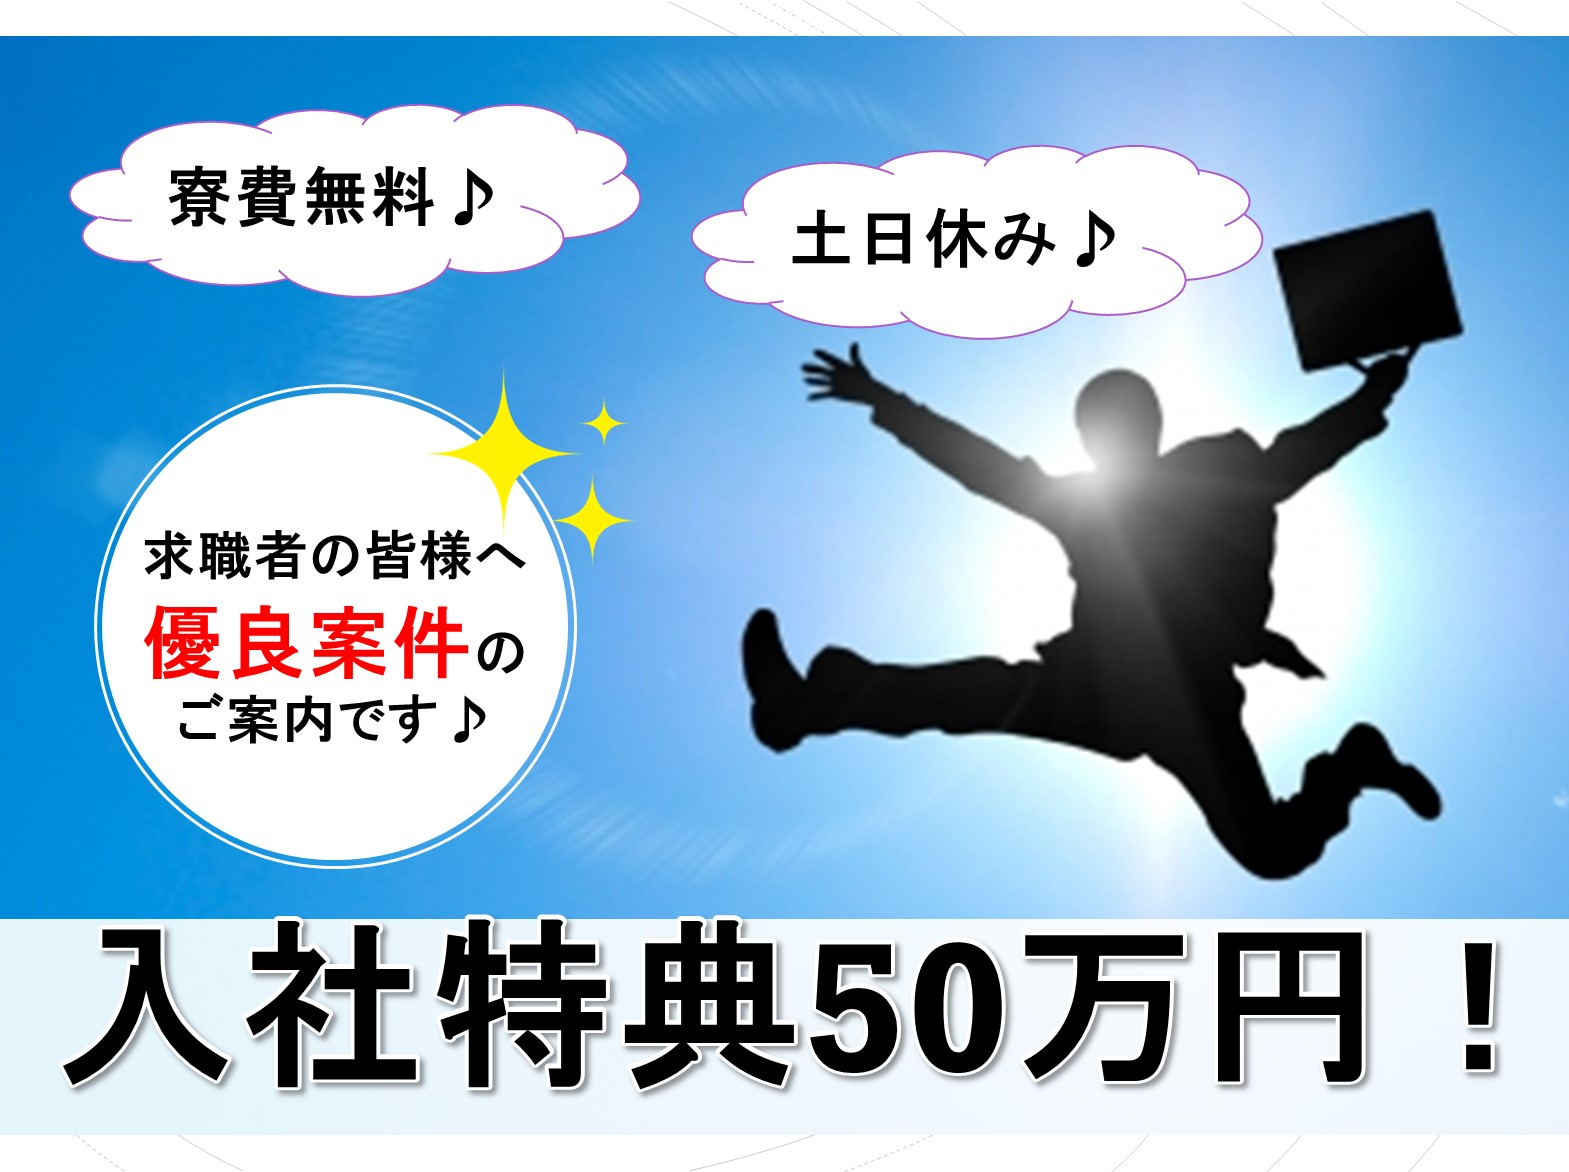 入社特典最大50万円!自動車の組立・検査 大阪府池田市 イメージ